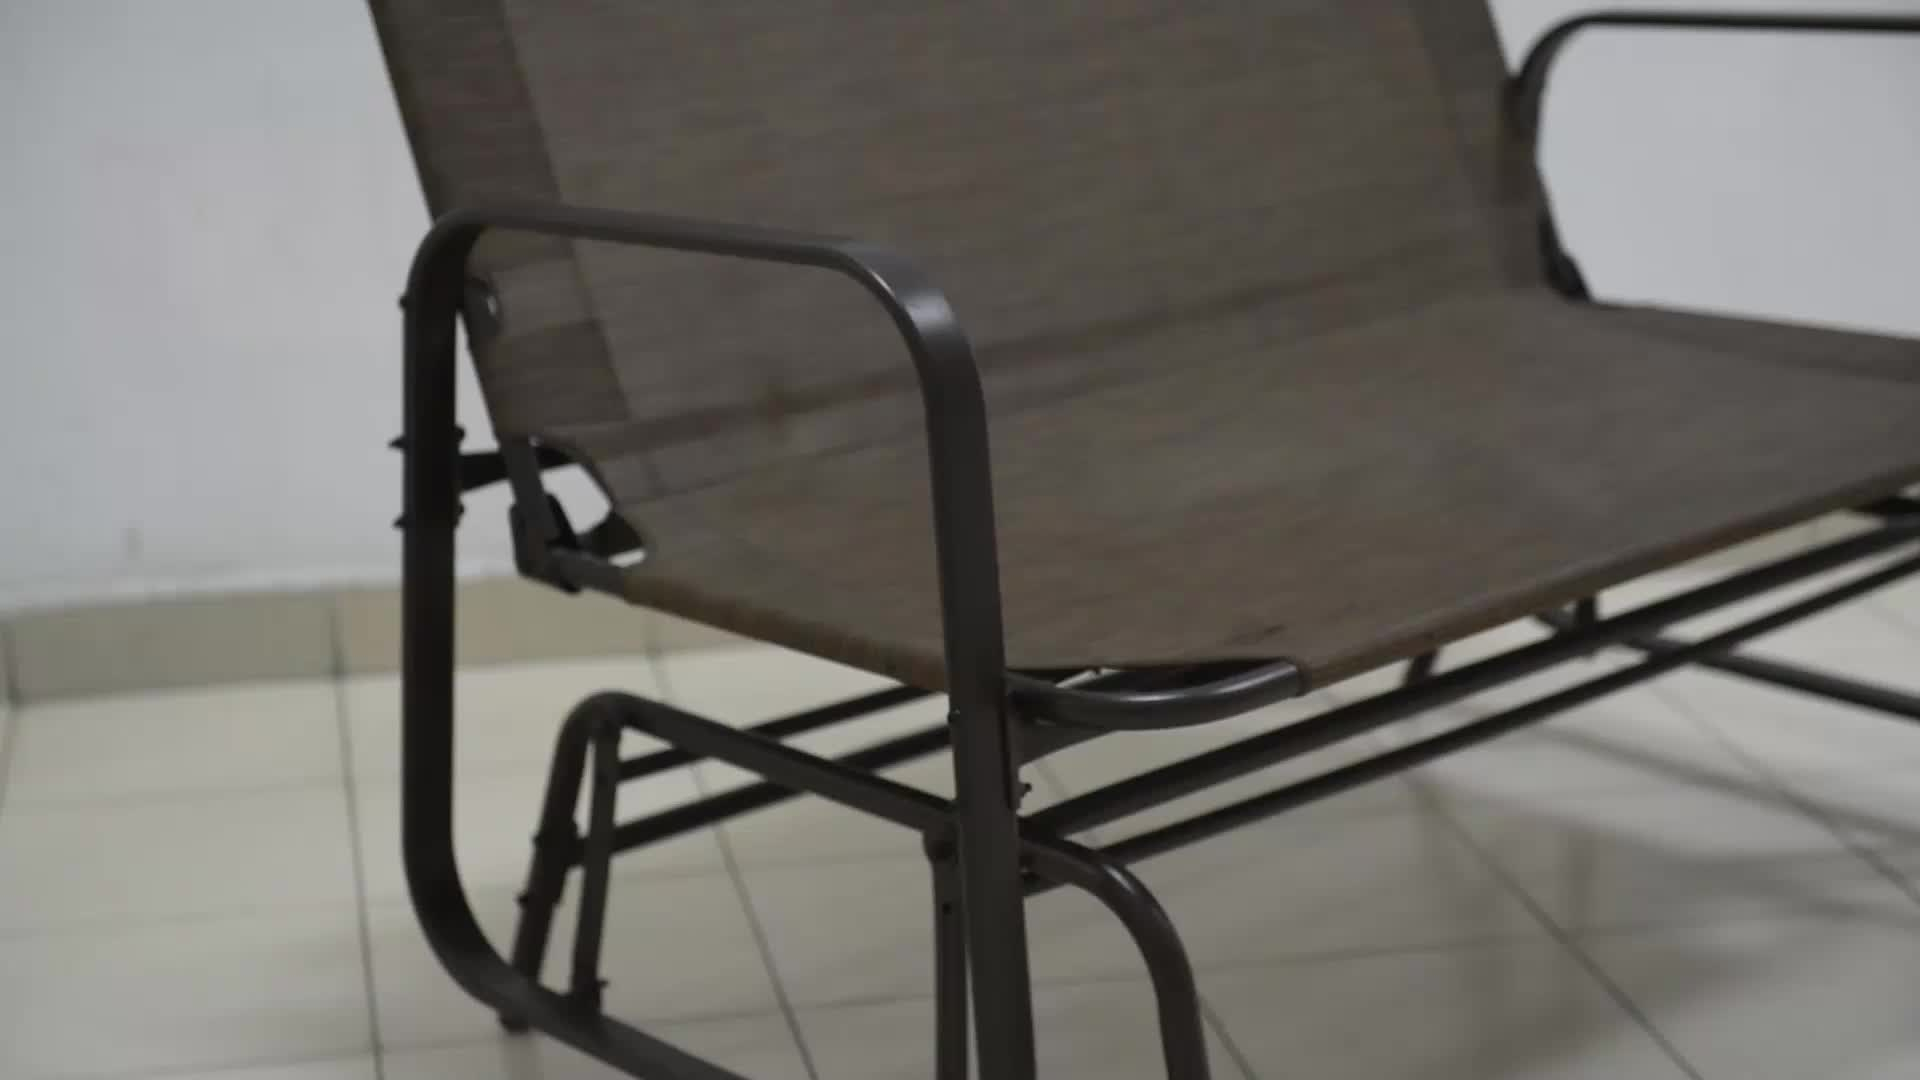 Outdoor Garden Steel Frame Patio Swing Glider Loveseat Bench Rocking Chair  – Buy Outdoor Garden Bench,metal Garden Bench,glider Rocking Chair Product Inside Black Outdoor Durable Steel Frame Patio Swing Glider Bench Chairs (Image 14 of 25)